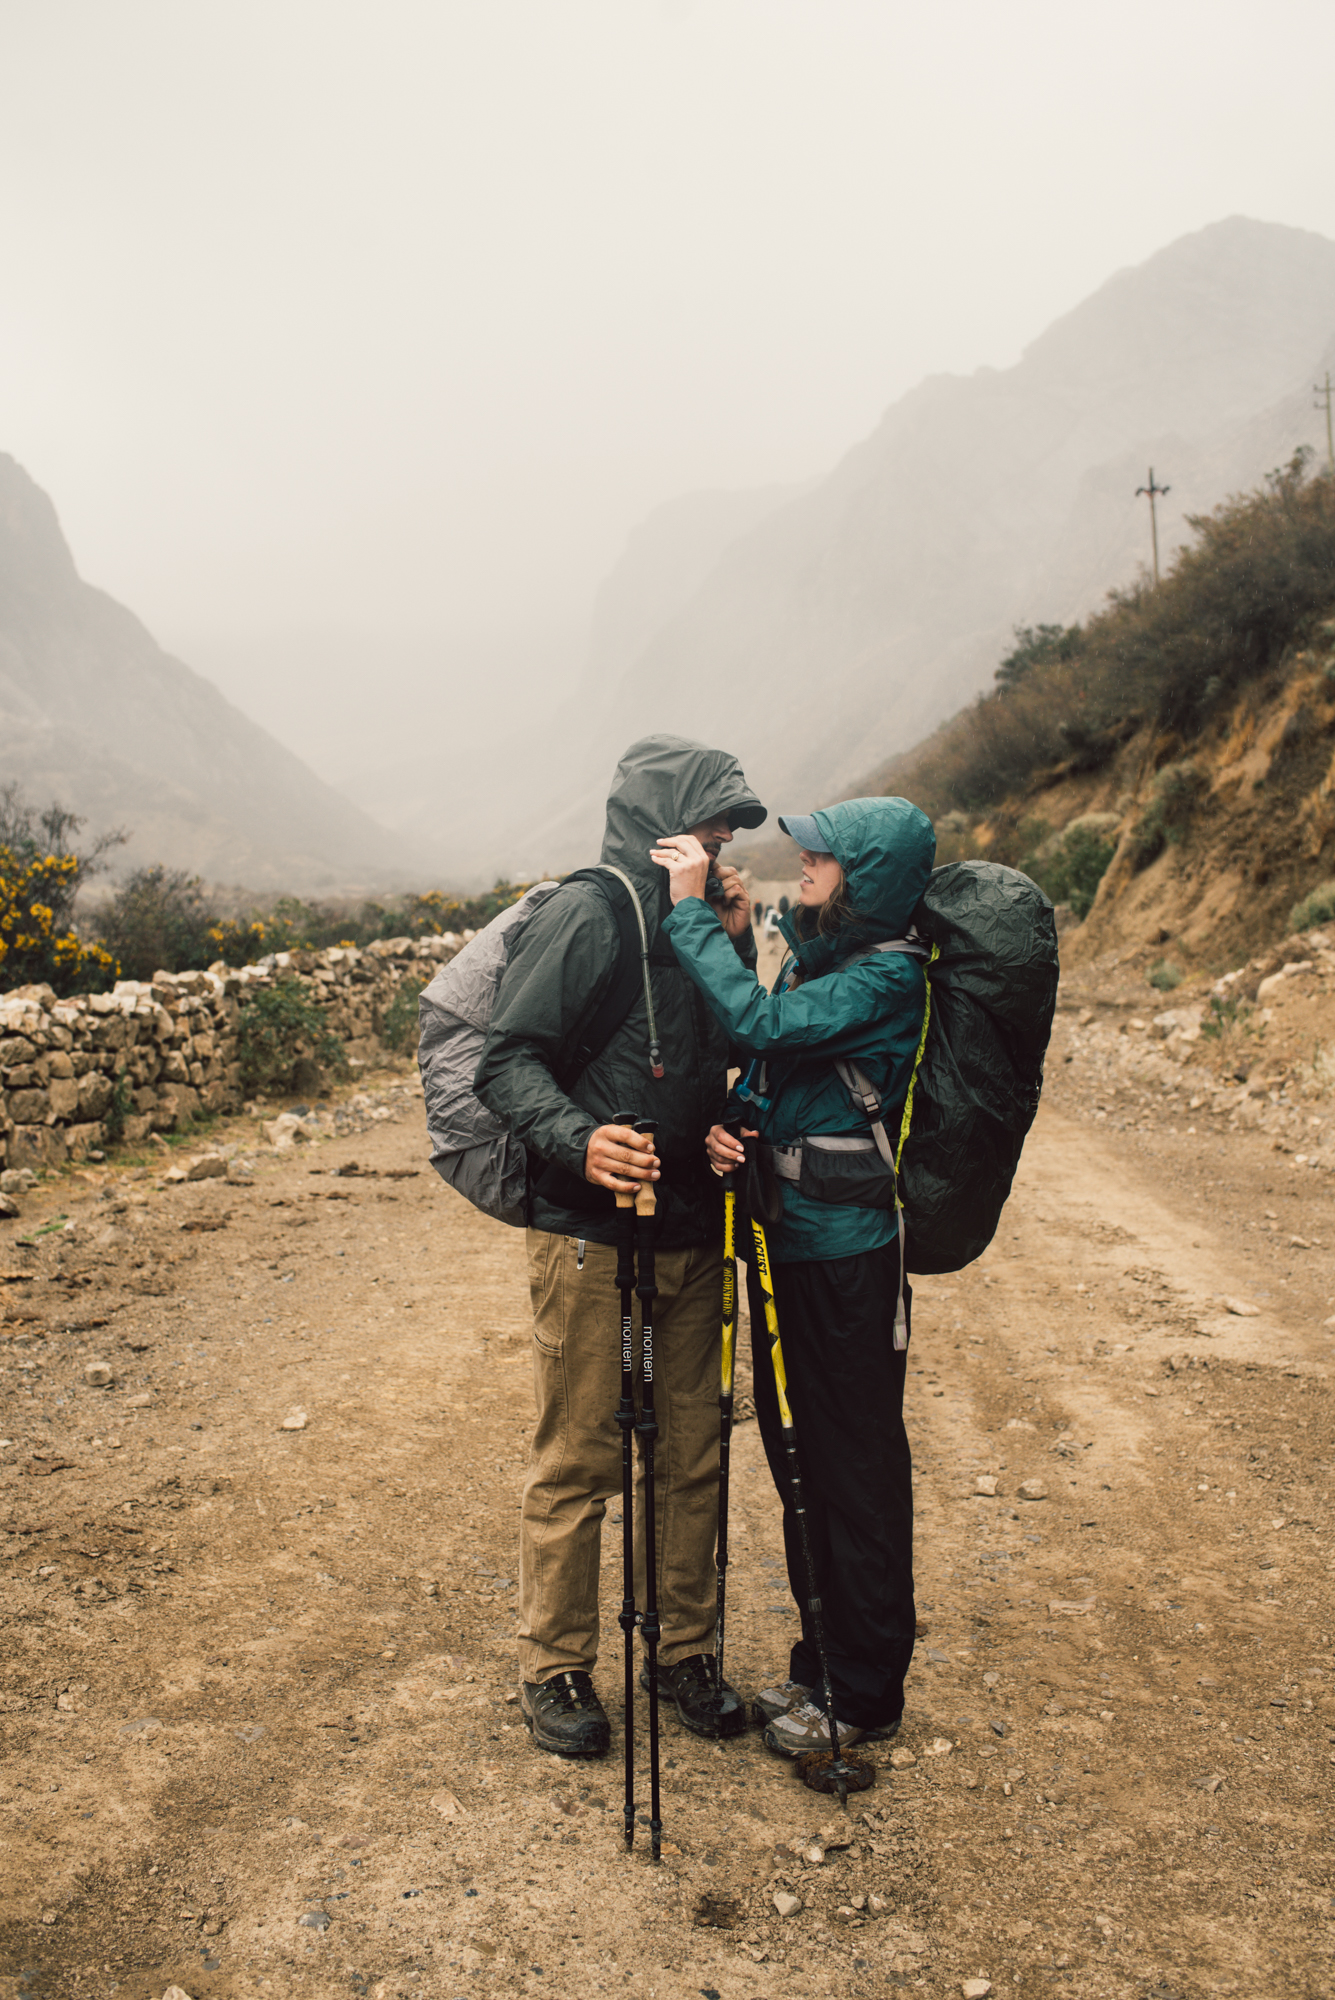 Damian and Jesse Engagement Session Huayhuash Mountain Trekking Peru_117.JPG